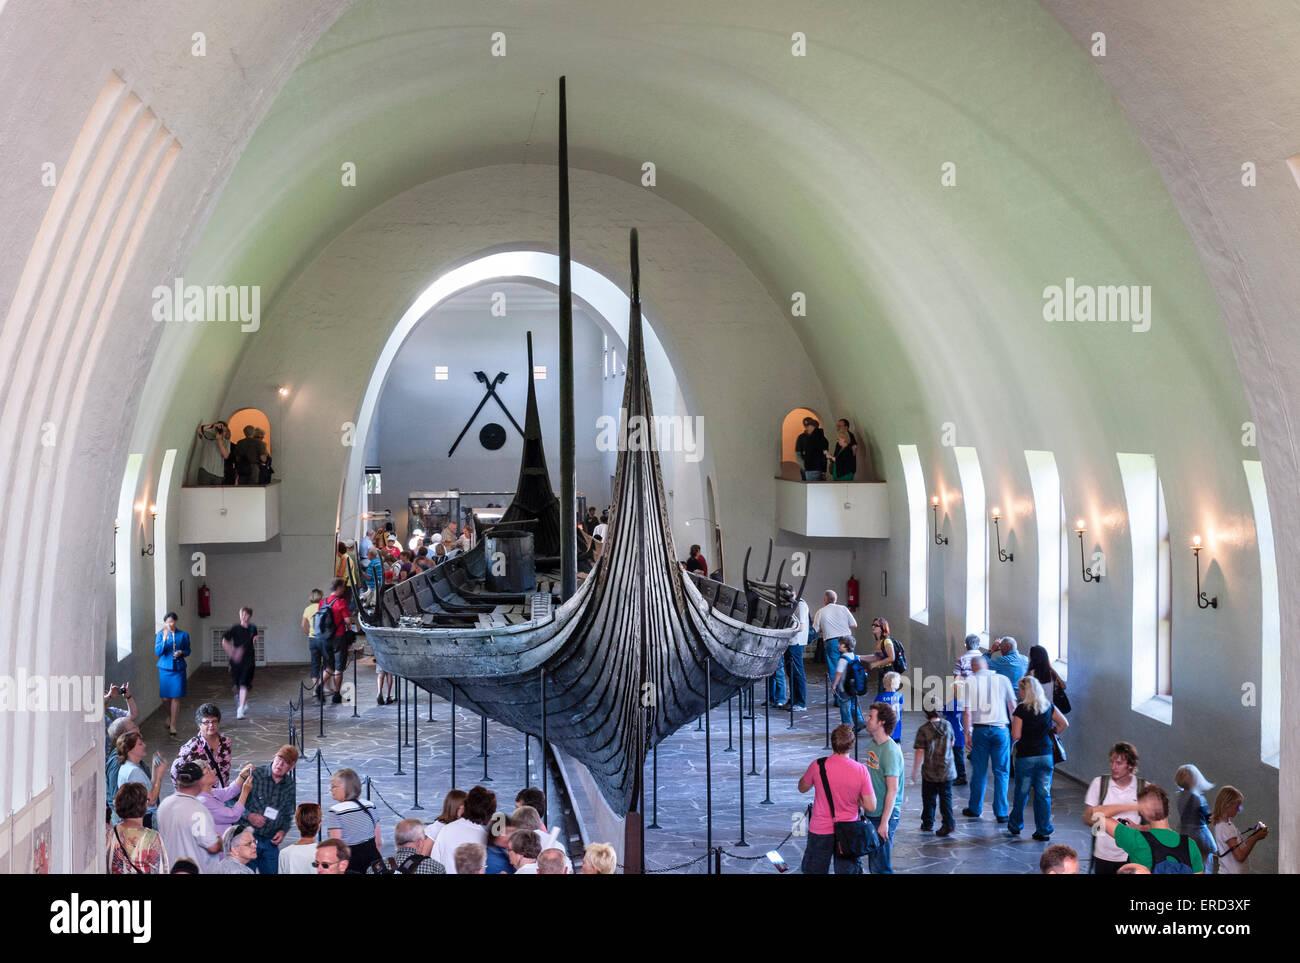 Oslo, Norway. The Viking Ship Museum (Vikingskipshuset på Bygdøy). The Oseberg longship is dated to about - Stock Image